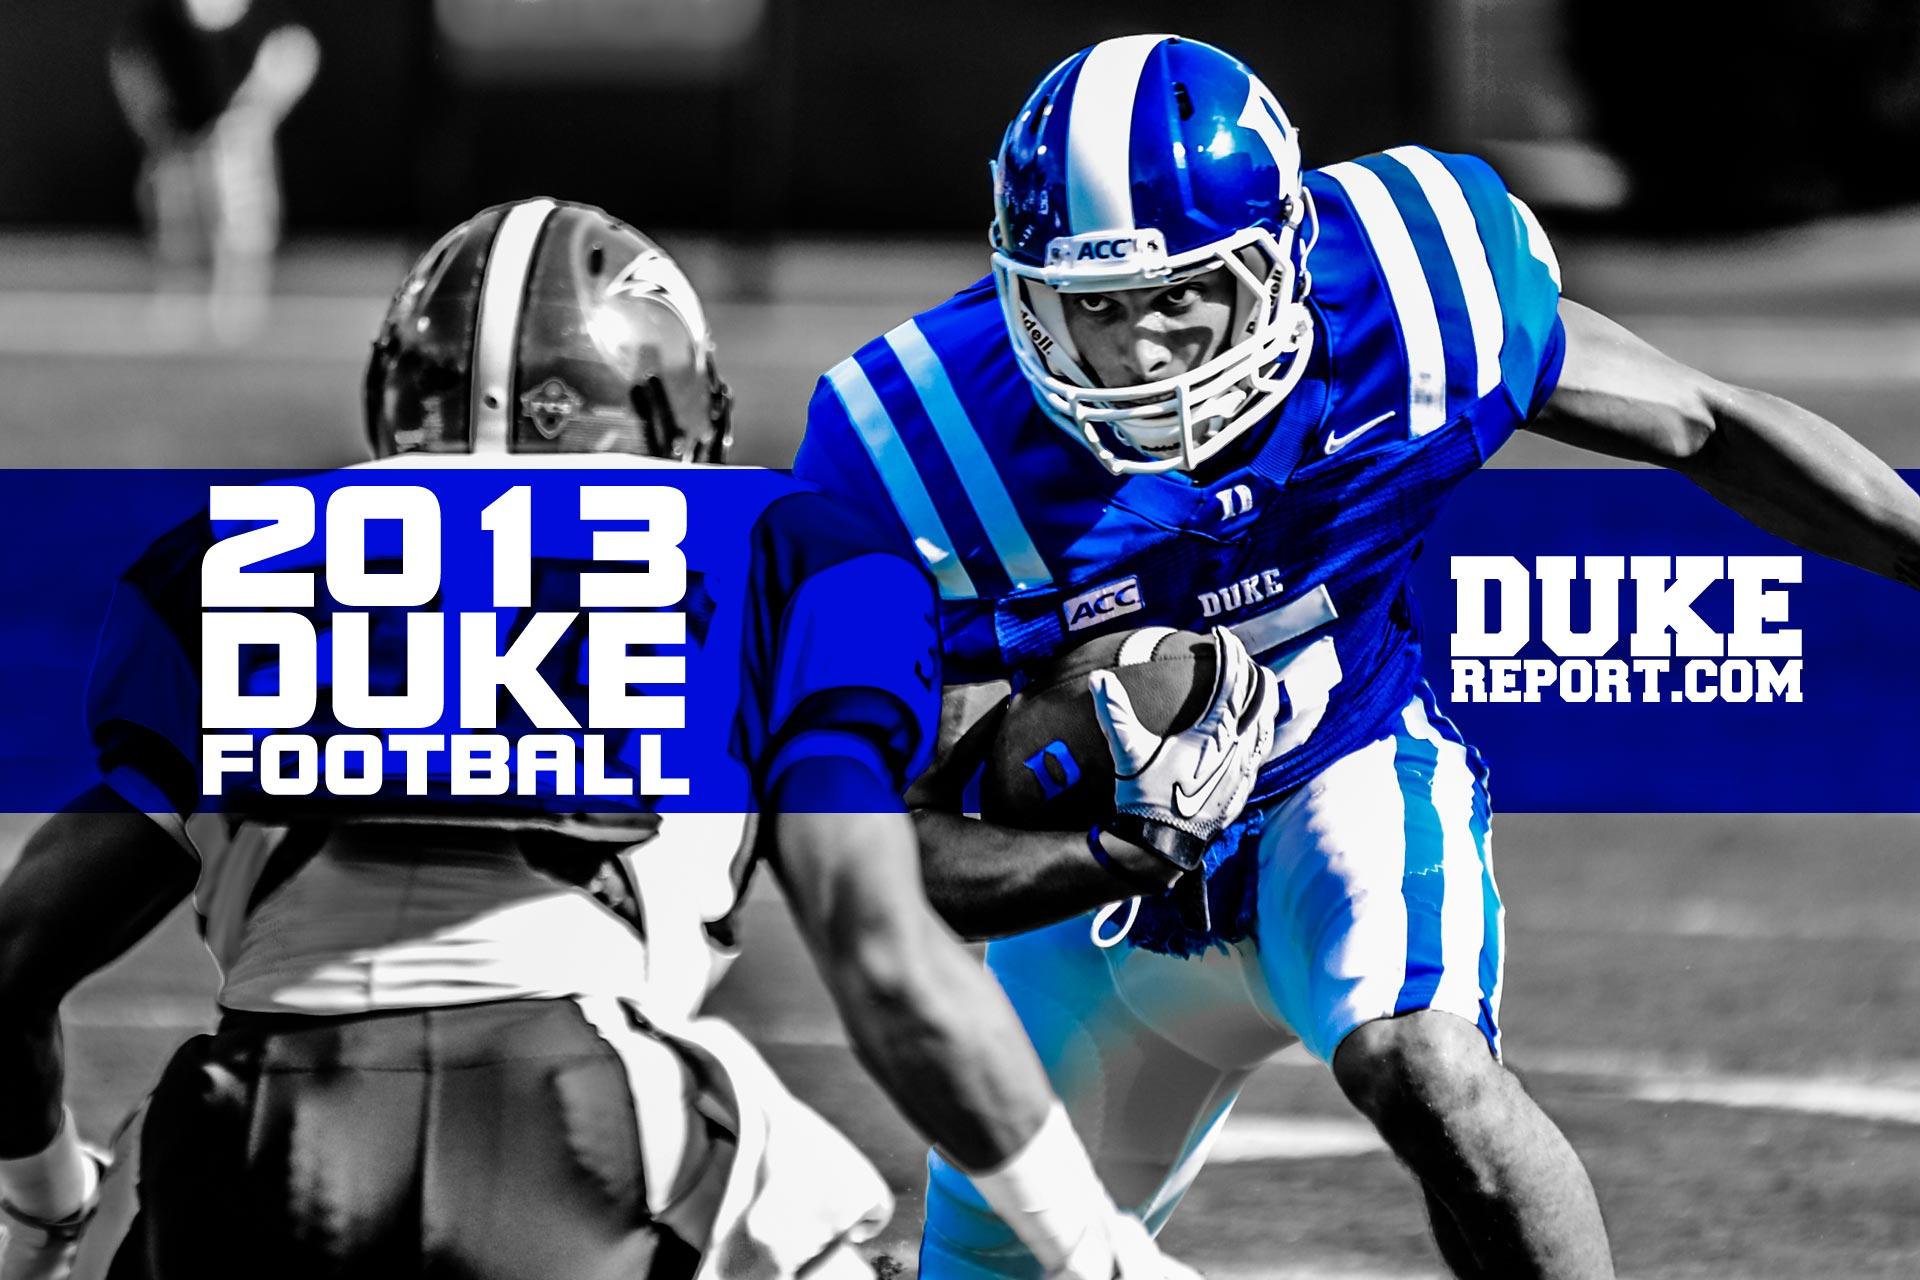 Duke Football Wallpapers 1920x1280